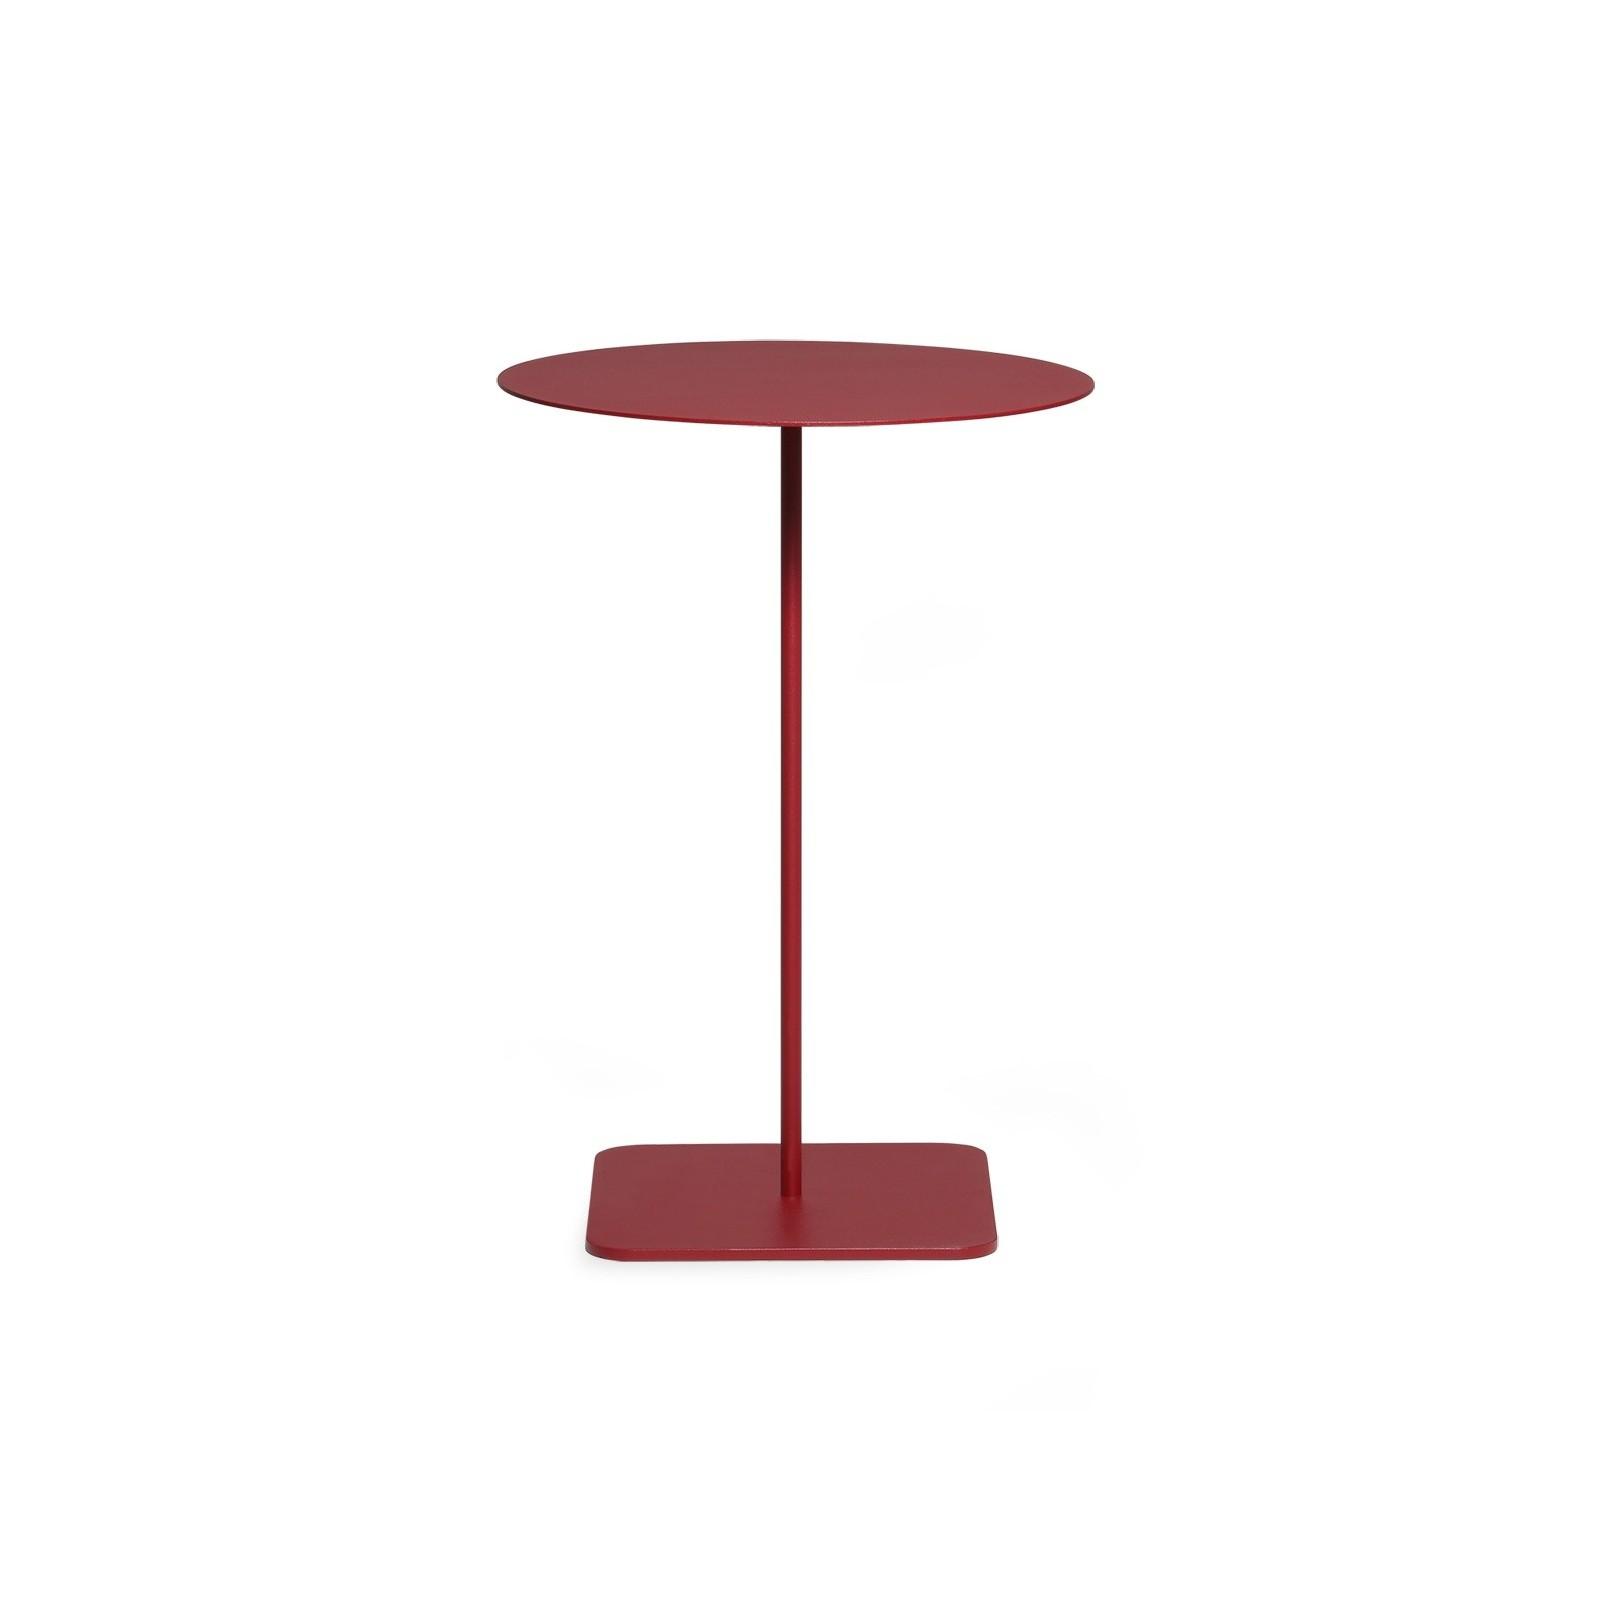 Mesita coffee table - 57 - red